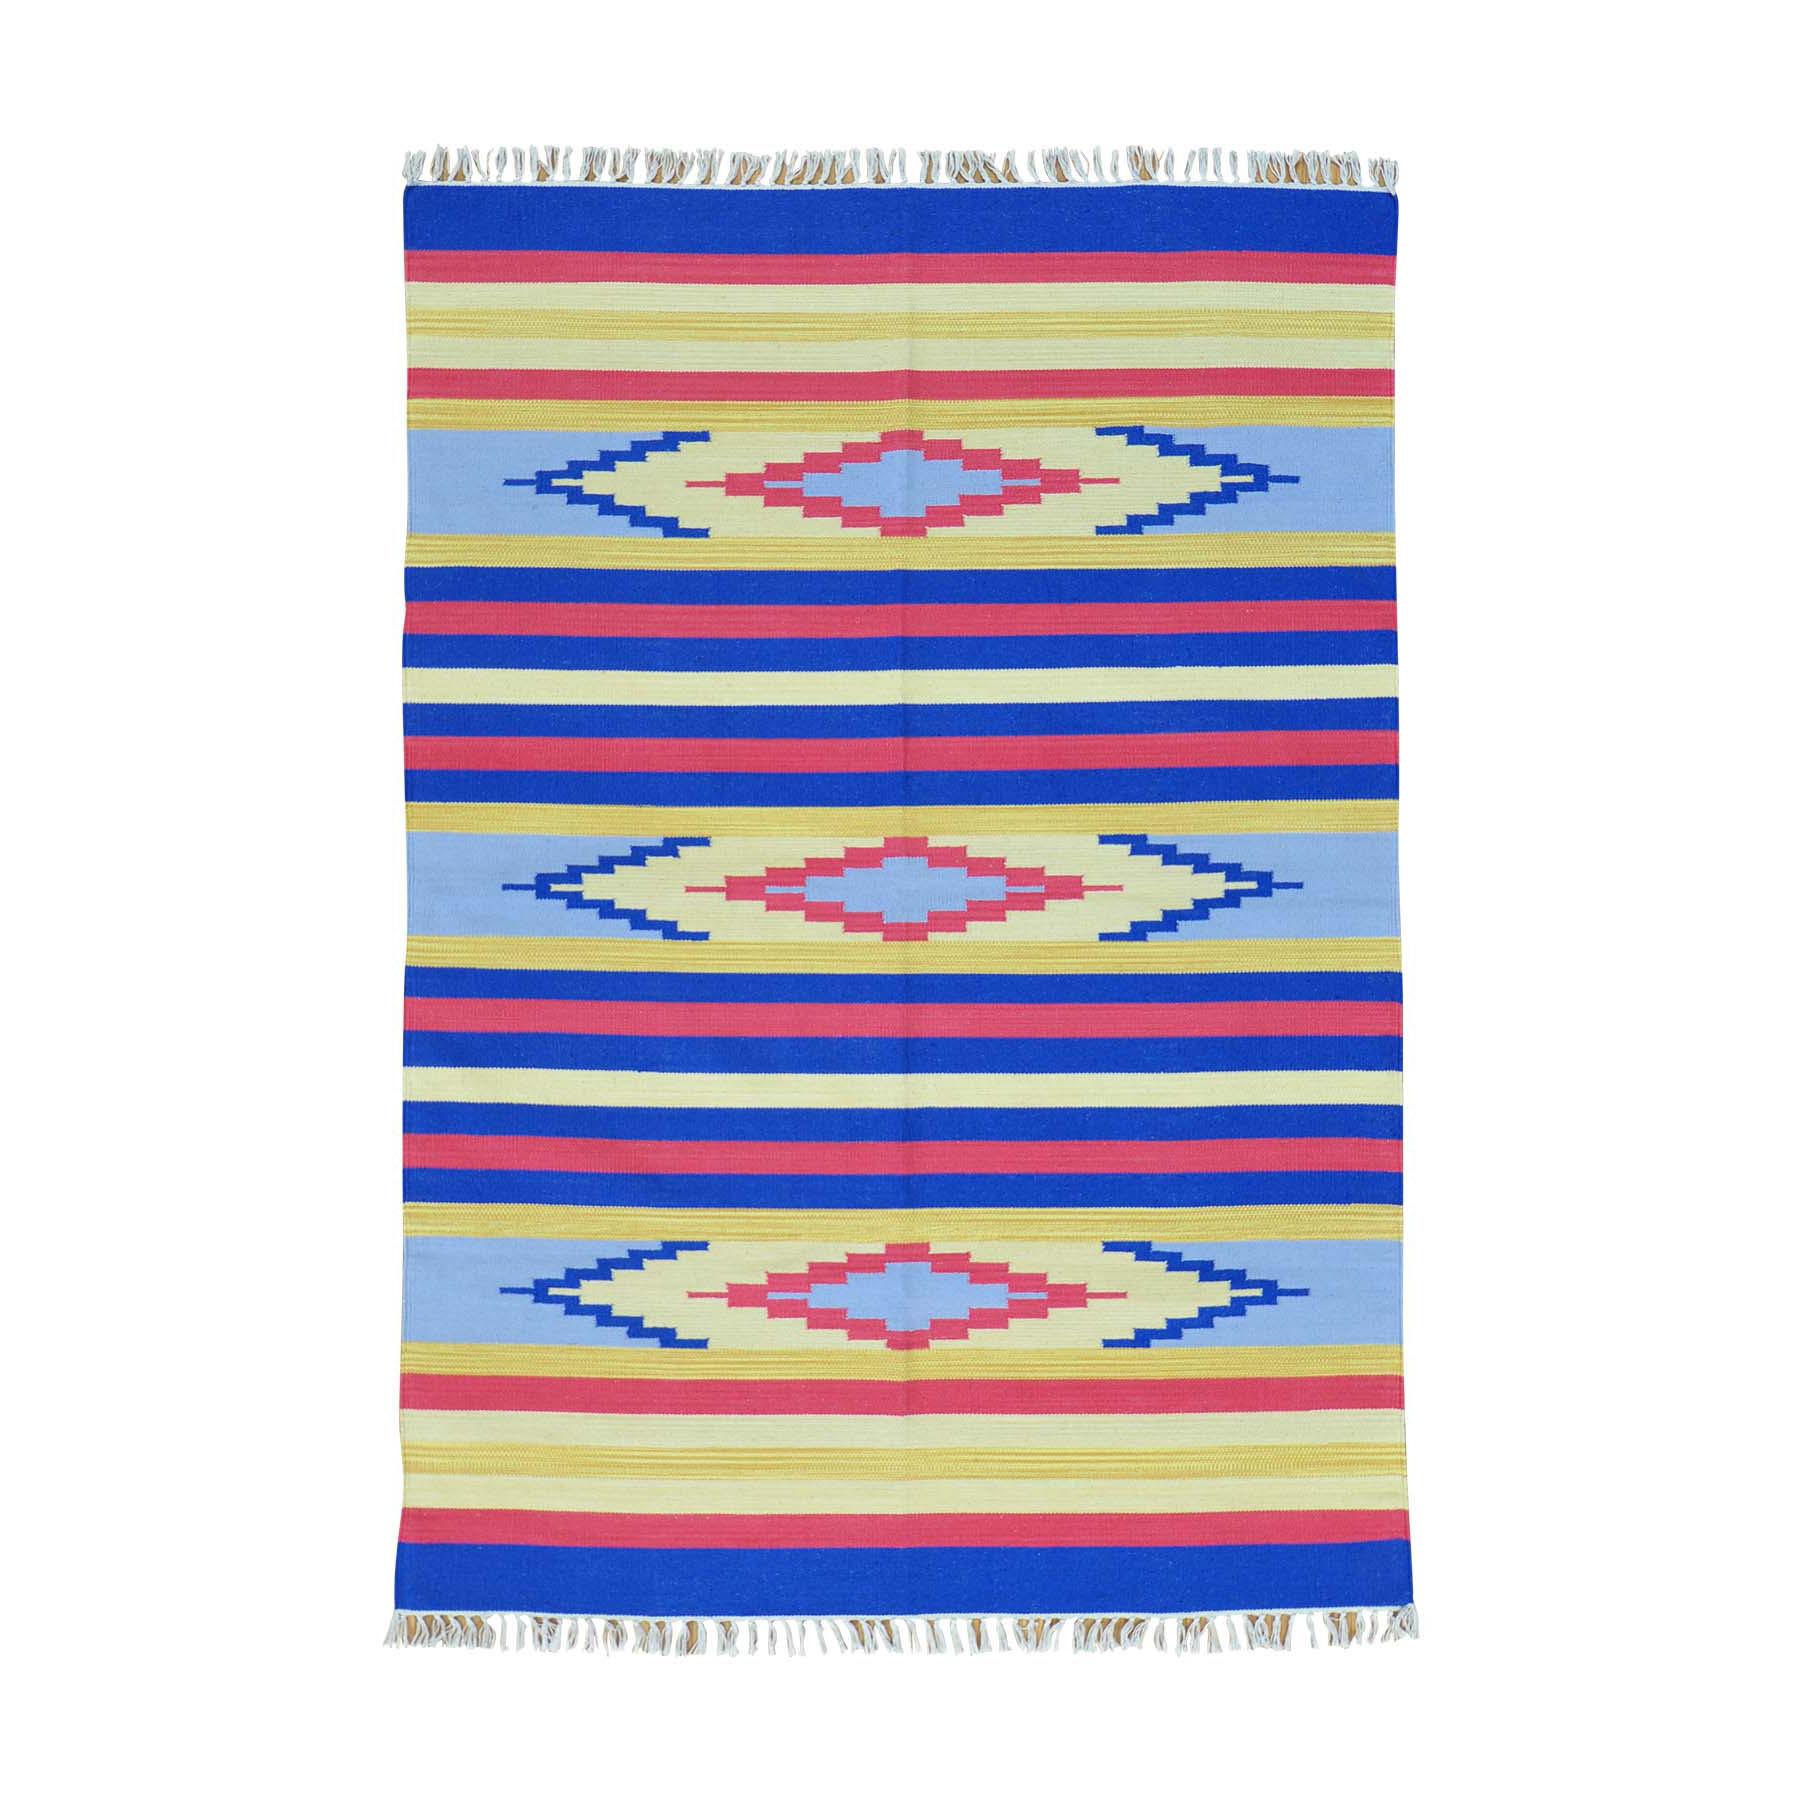 "5'x7'1"" Flat Weave Hand Woven Navajo Design Reversible Killim Rug"